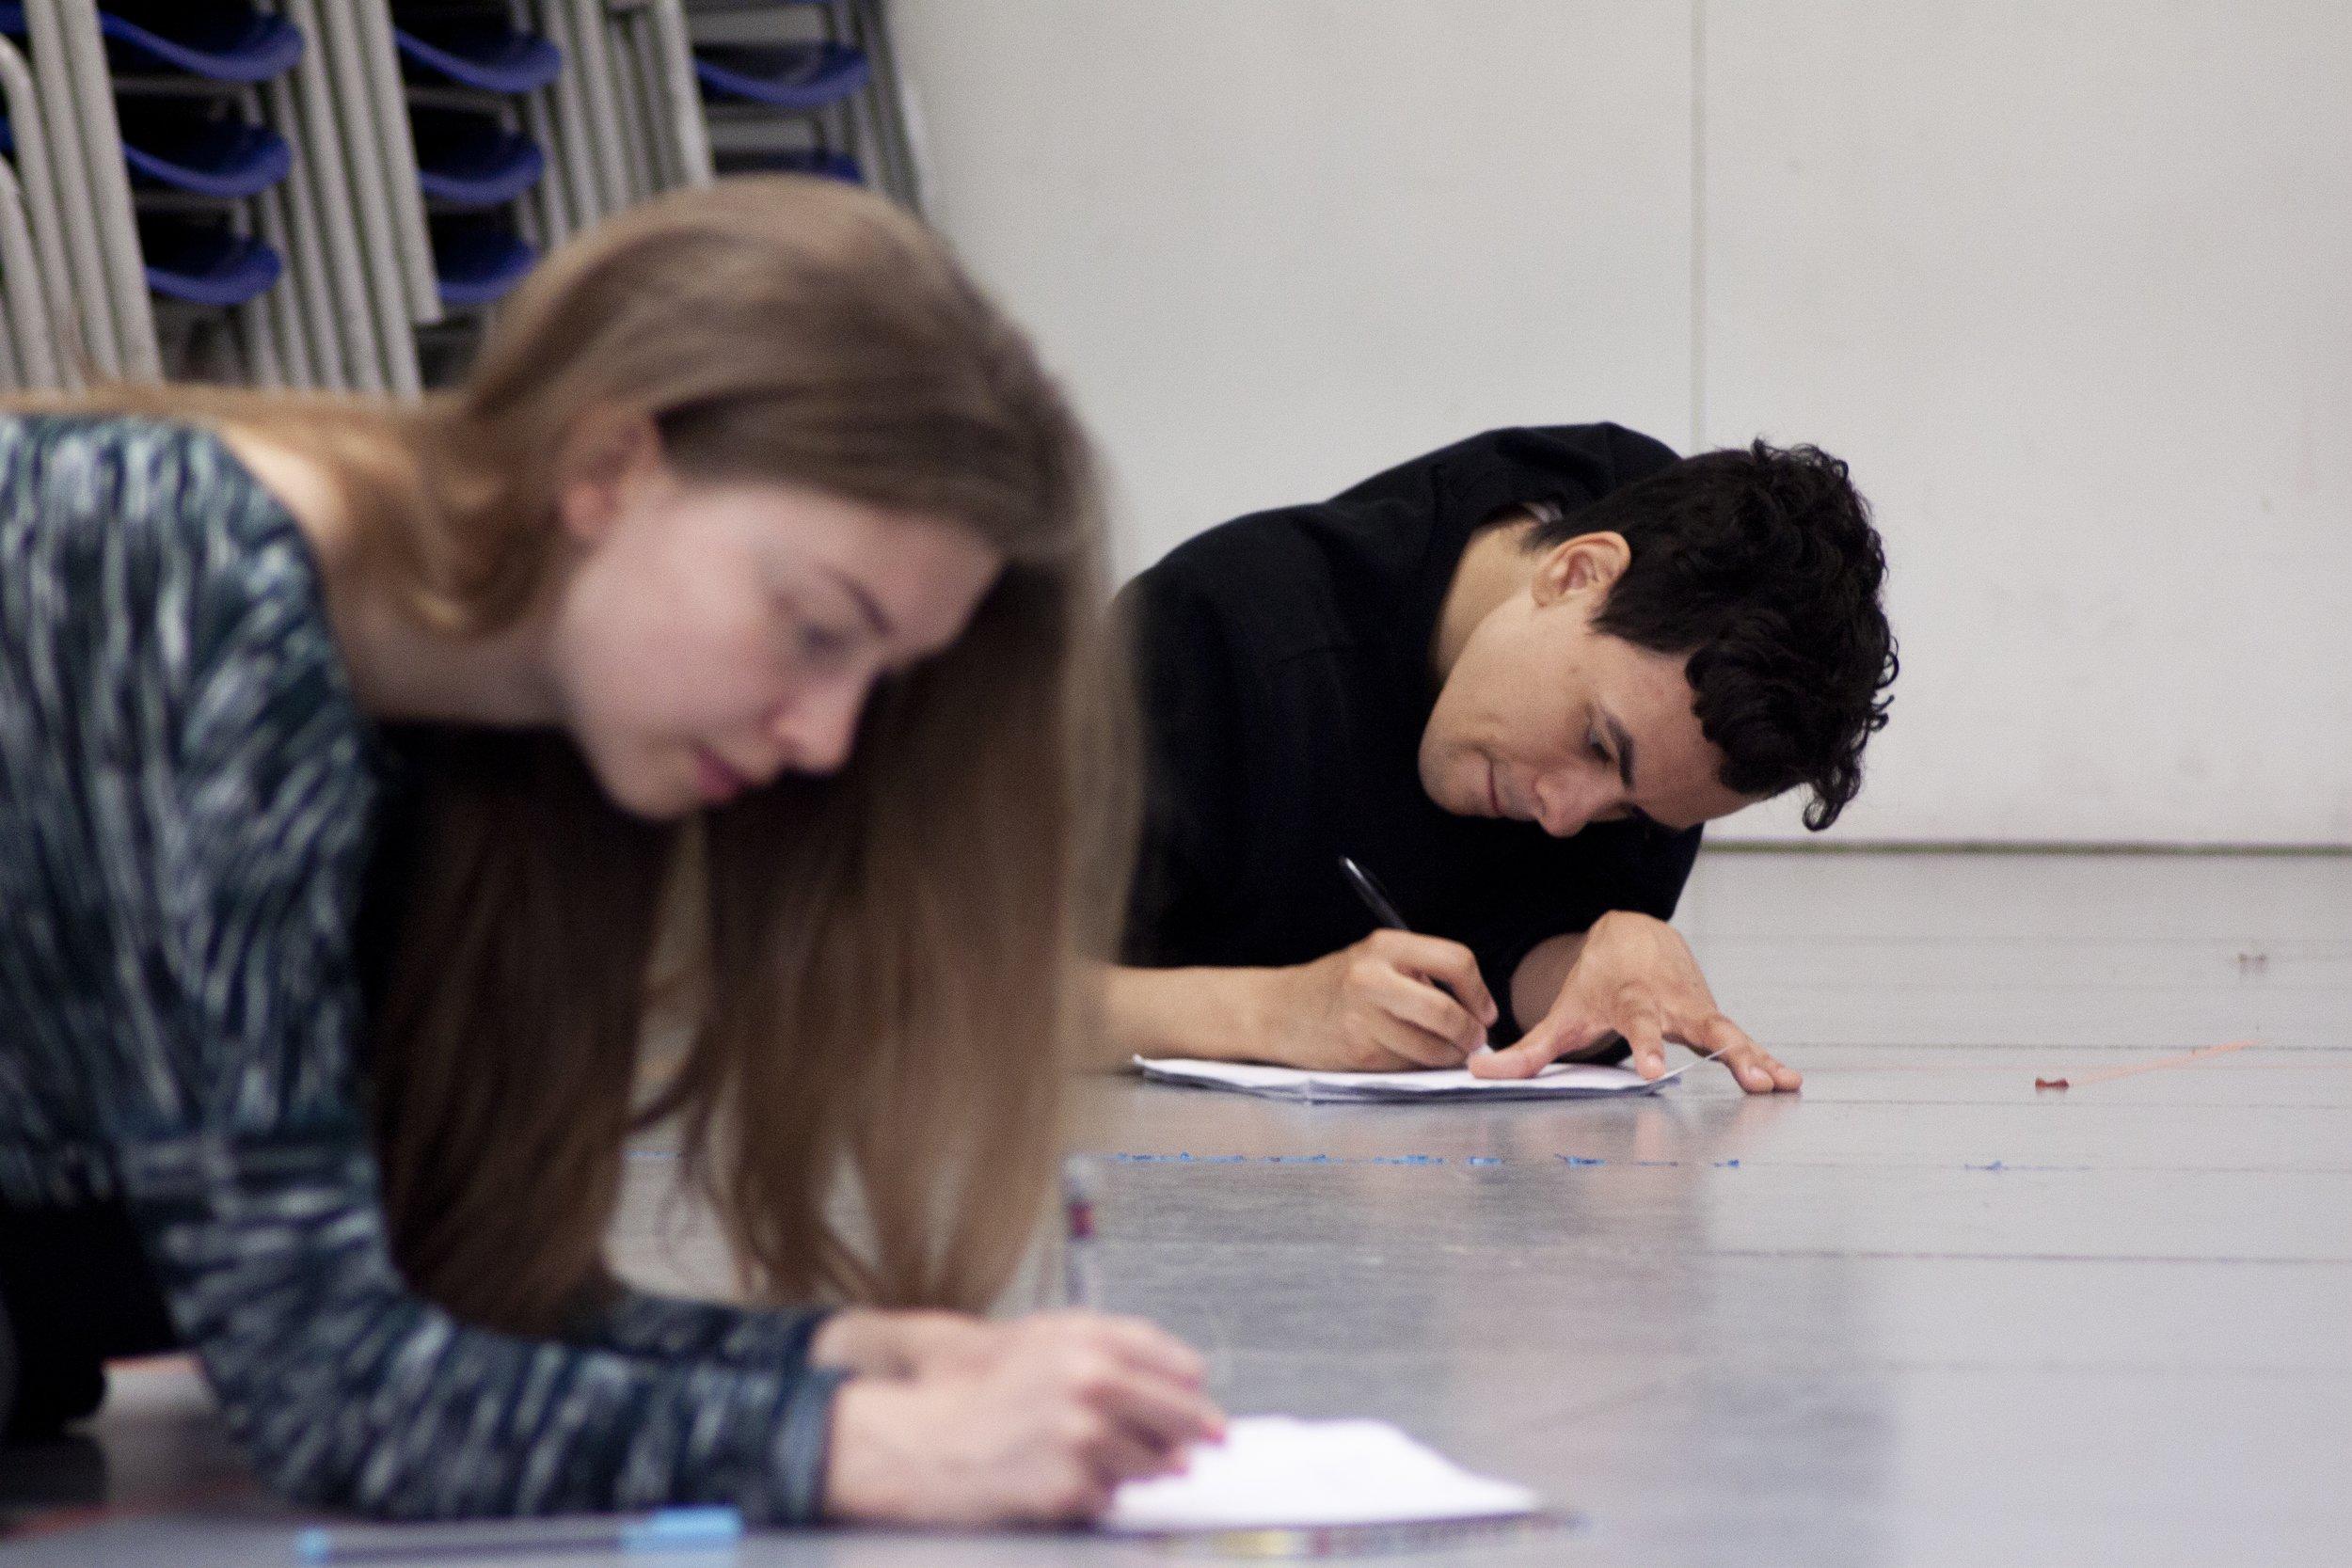 Kathryn Crosby (Laura), Aaron Douglas (Ollie), rehearsal image.